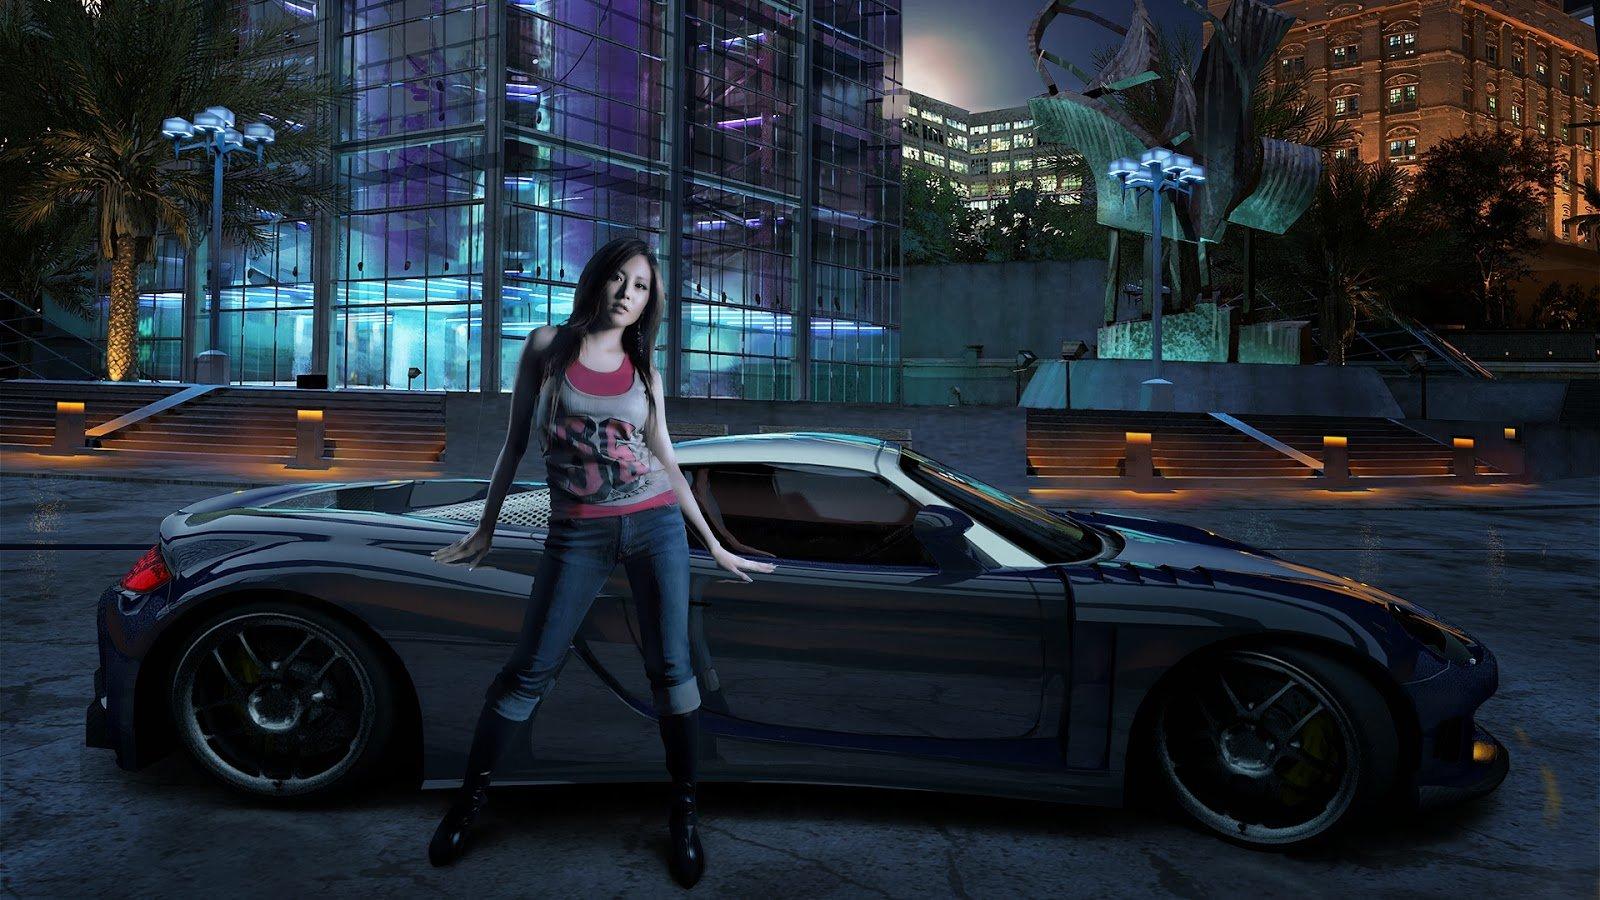 Girl with sports car night background HD wallpaper free downloadjpg 1600x900